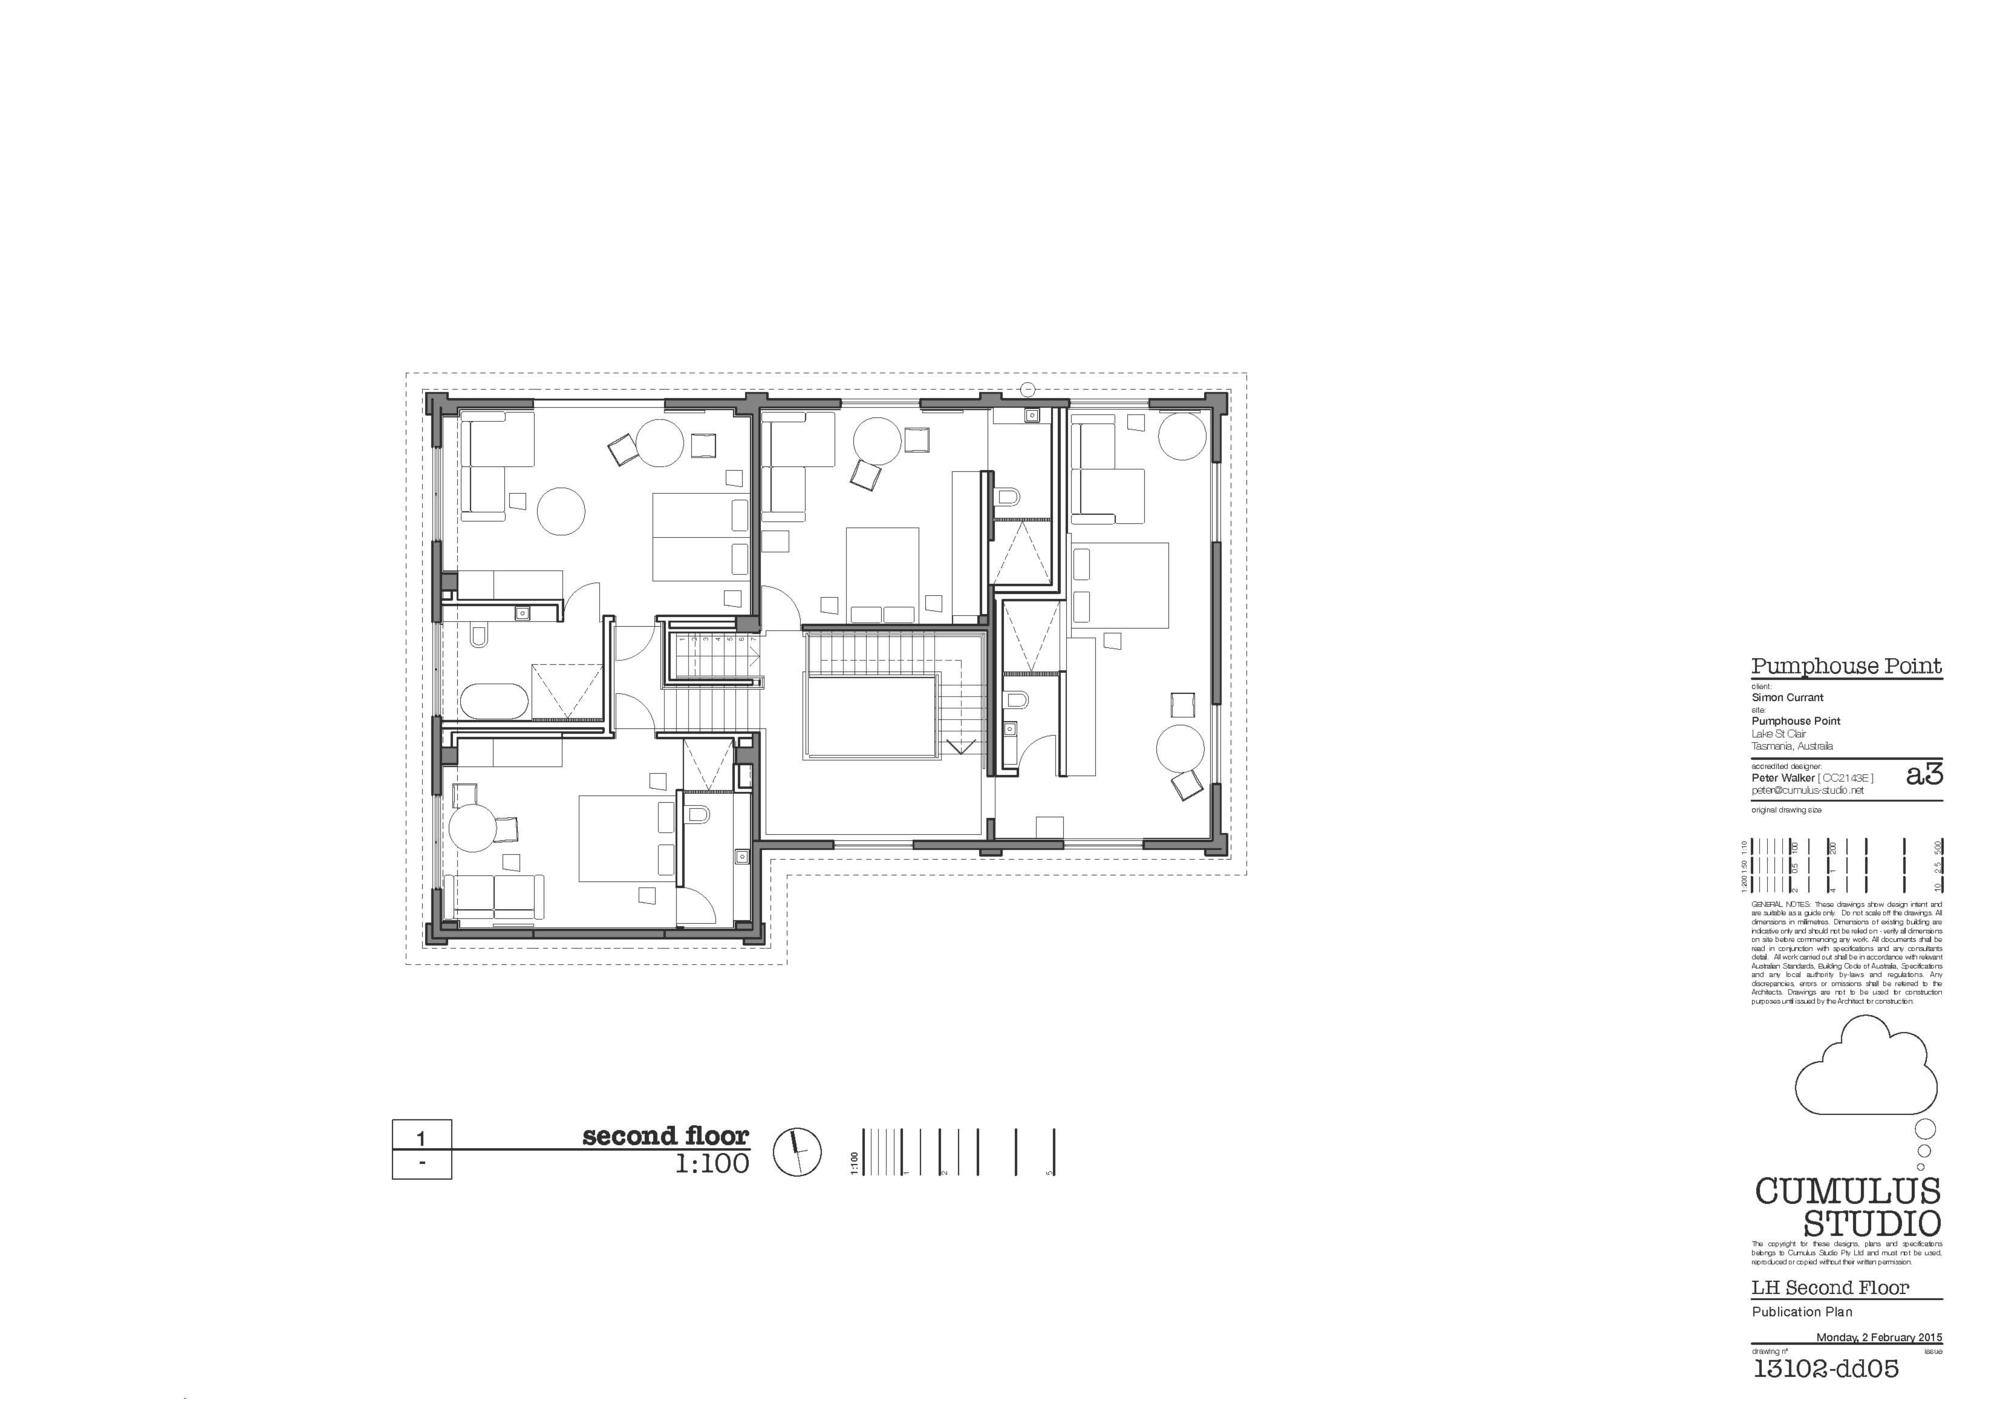 Pumphouse_Point-Cumulus_Studio-31